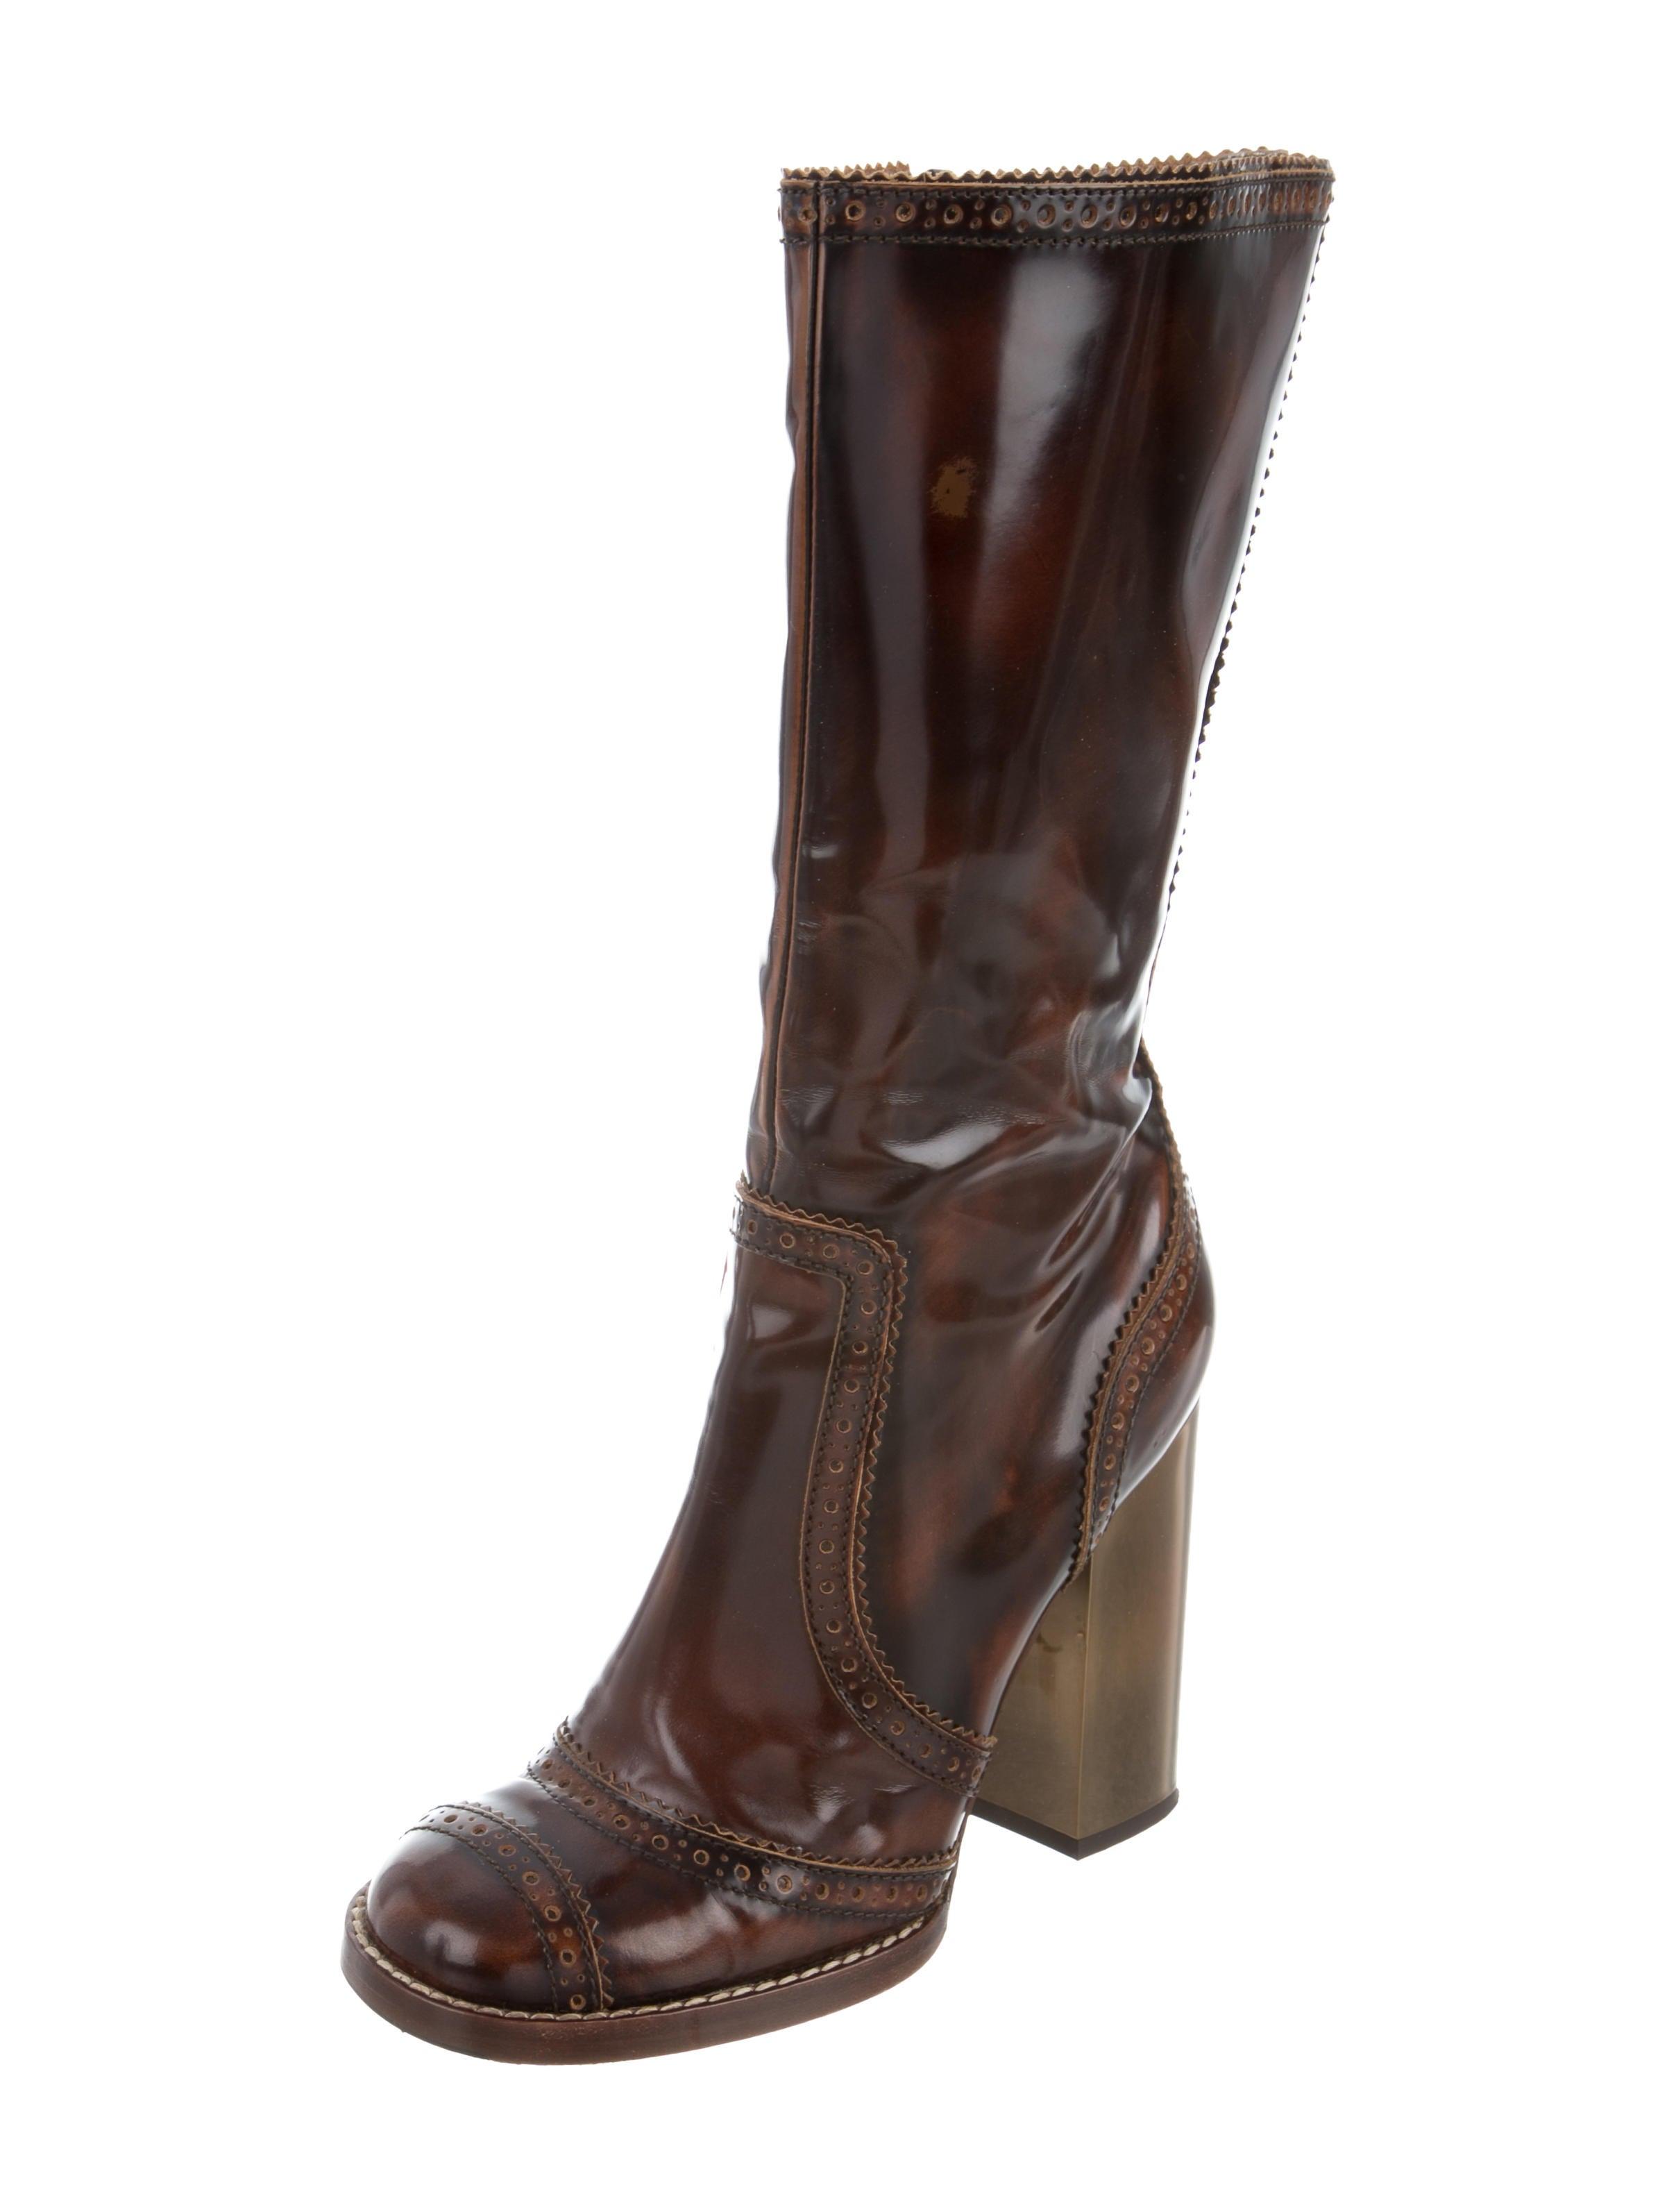 free shipping sale online D&G Brogue Mid-Calf Boots discount huge surprise sale very cheap F4H00NJ7e